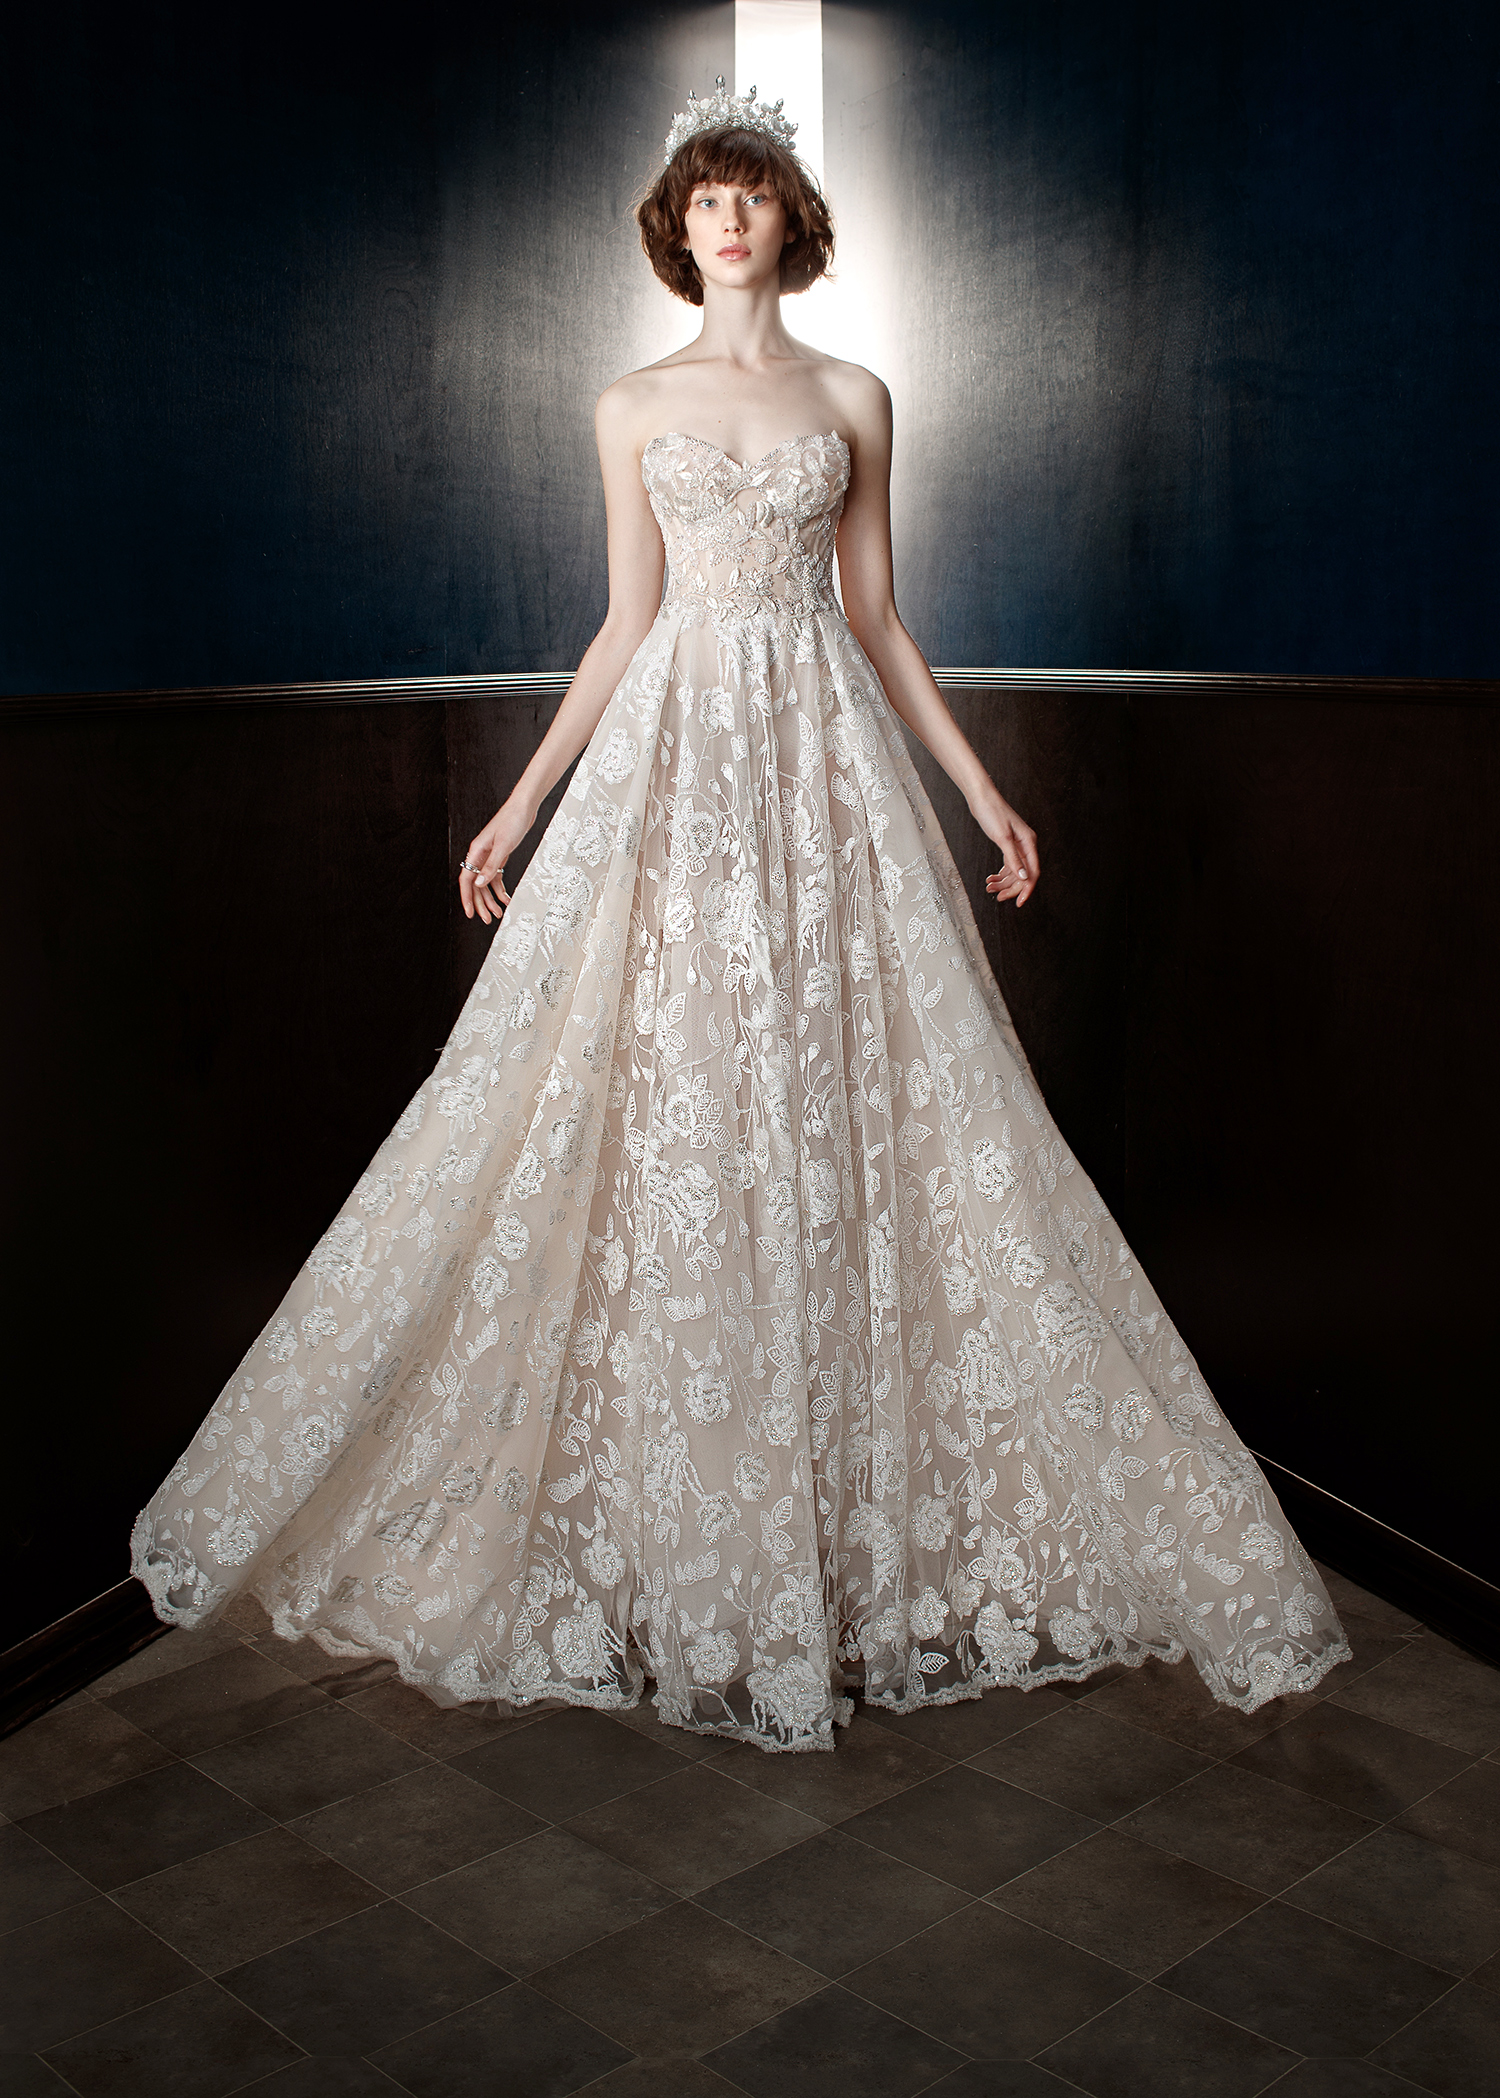 galia lahav wedding dress spring 2018 floral a-line sweetheart